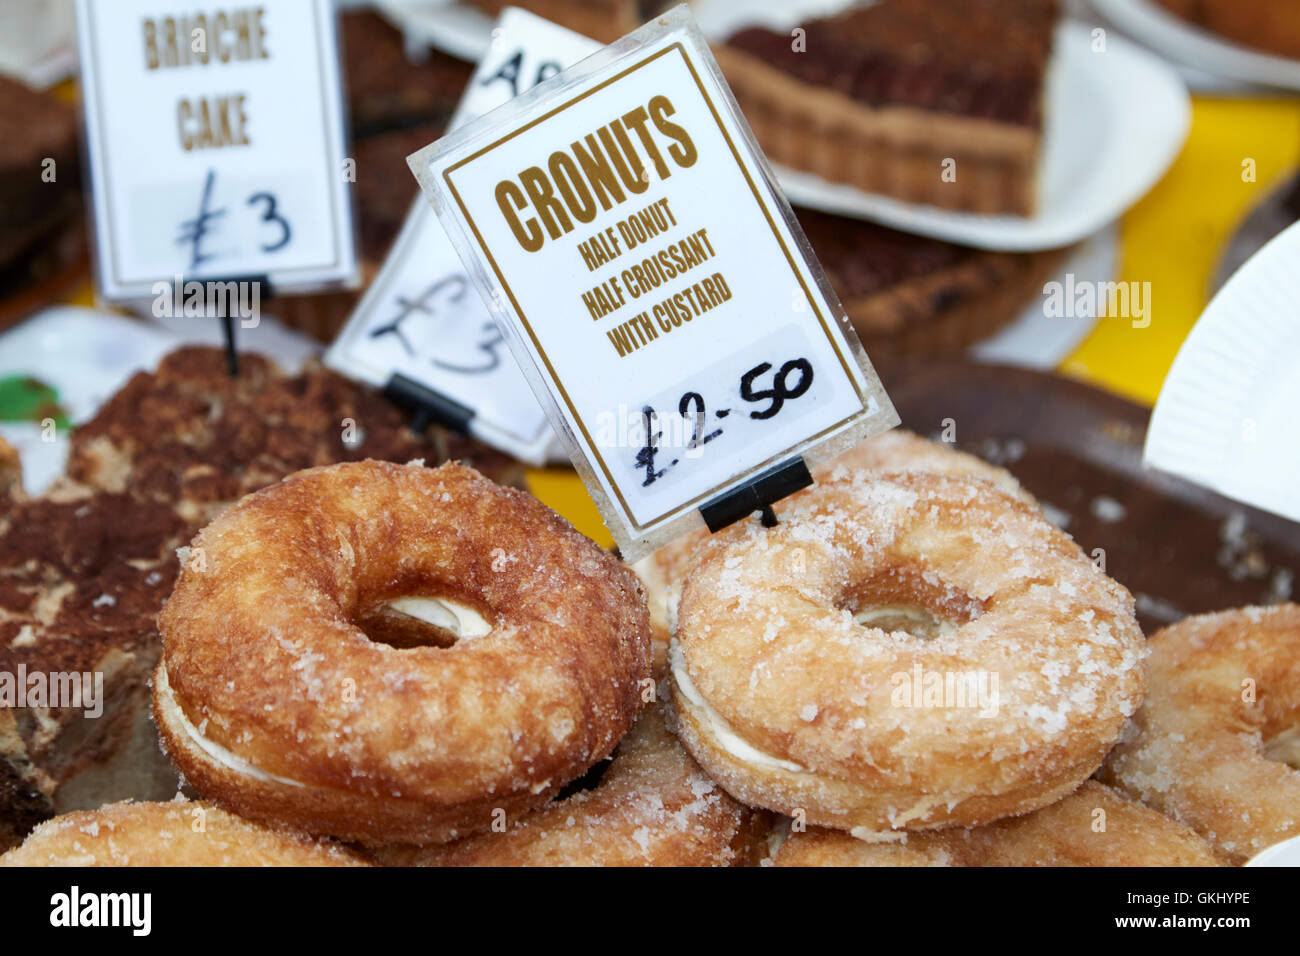 Mitad cronuts mitad donut croissant hojaldre Imagen De Stock